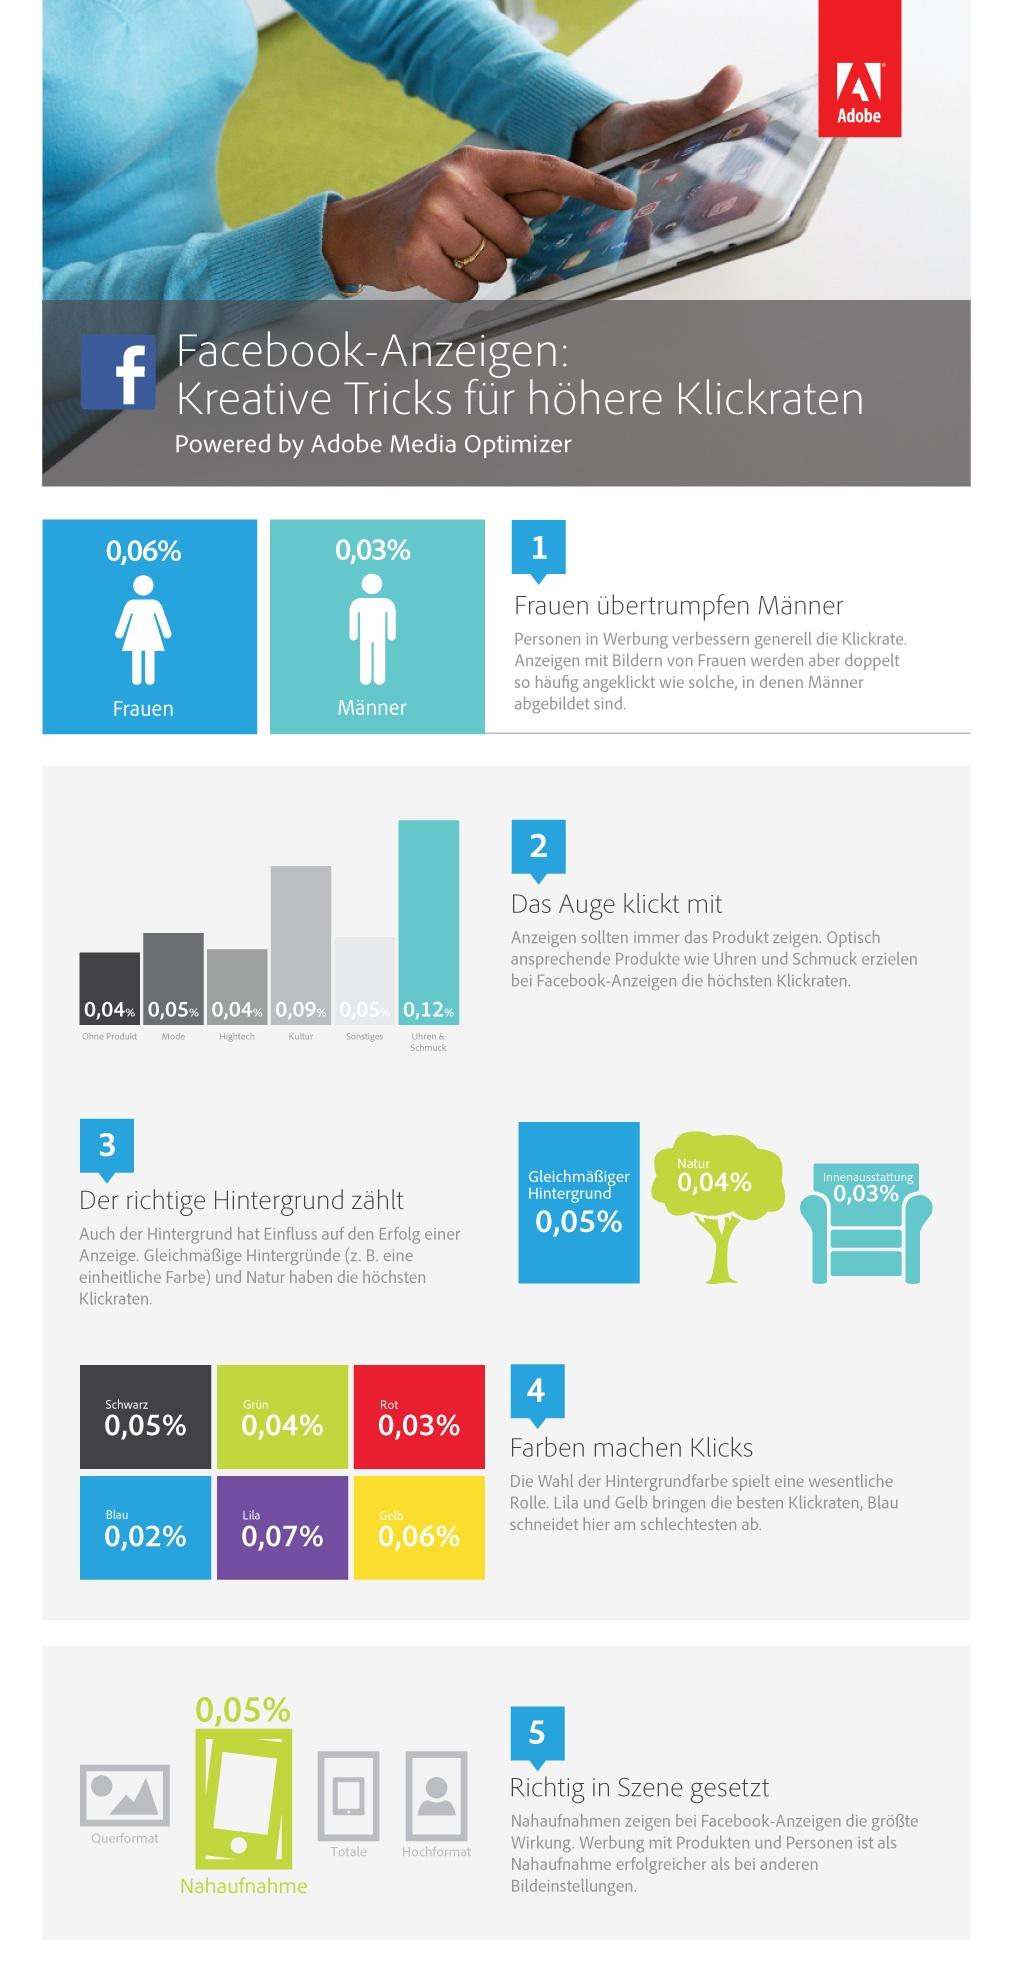 der perfekte Facebook Beitrag - Infografik 2013